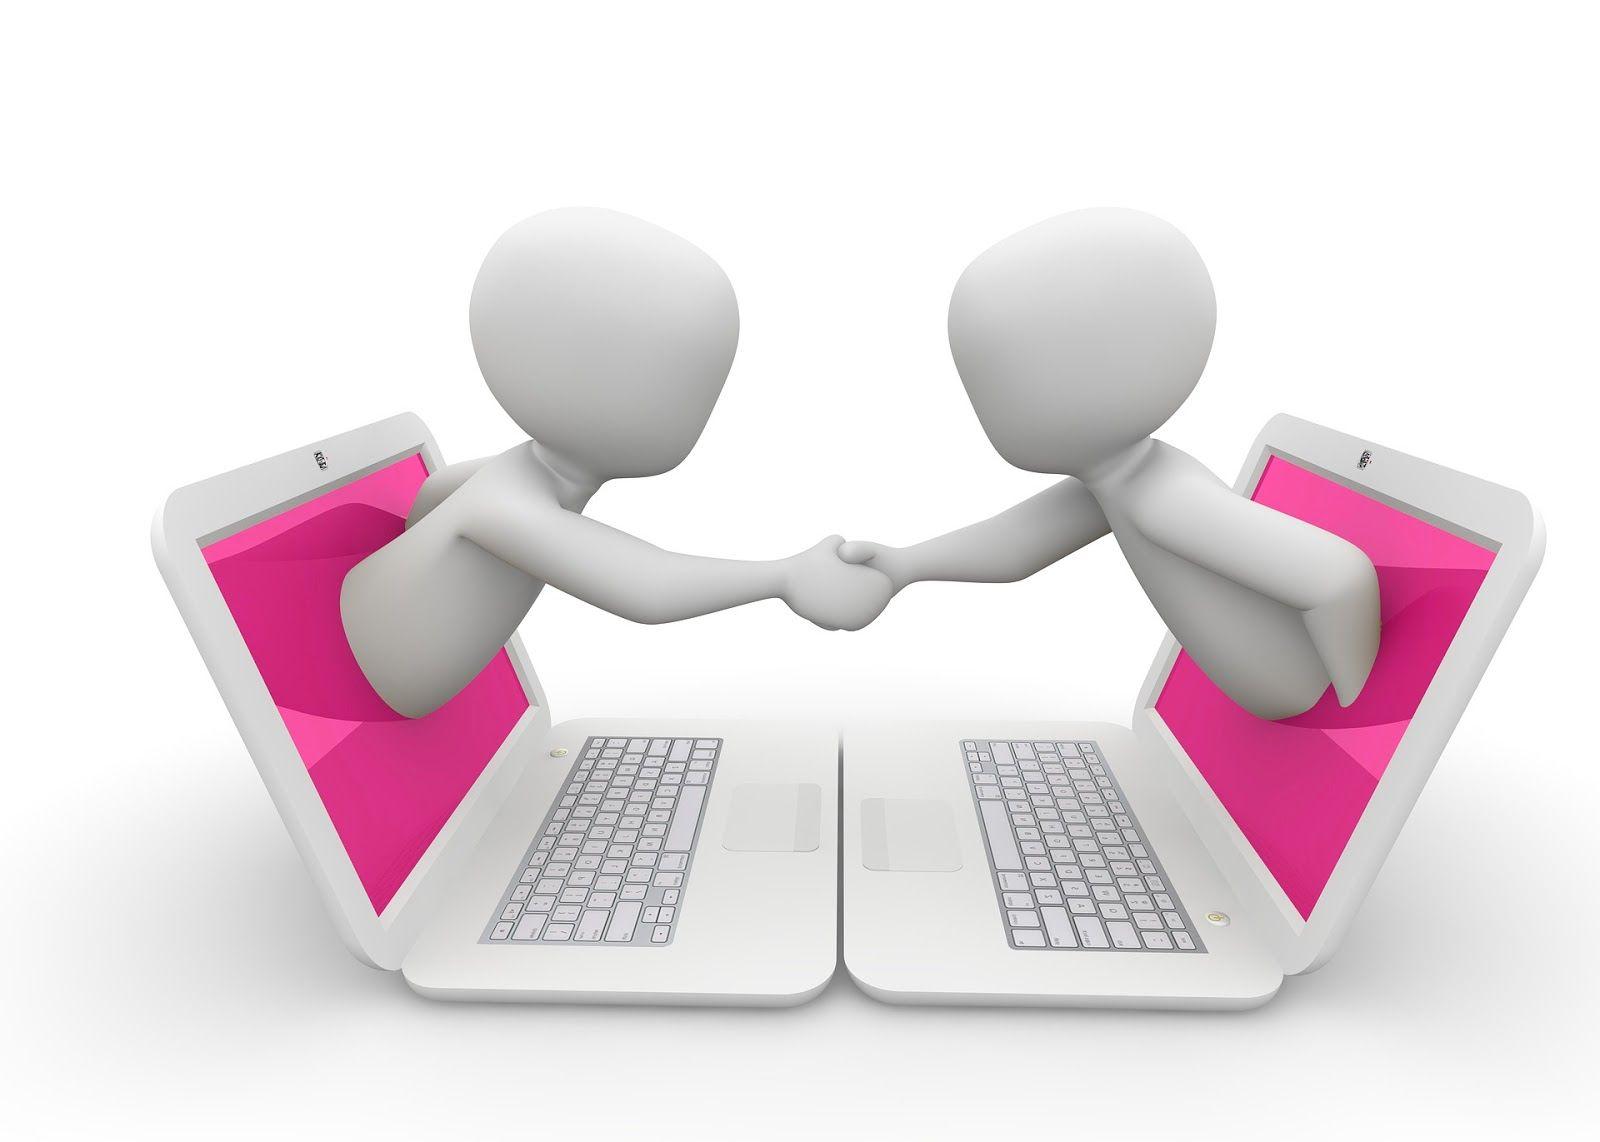 Gupshup Corner Chat Room Chatib And Chatiw Chat Room Dating